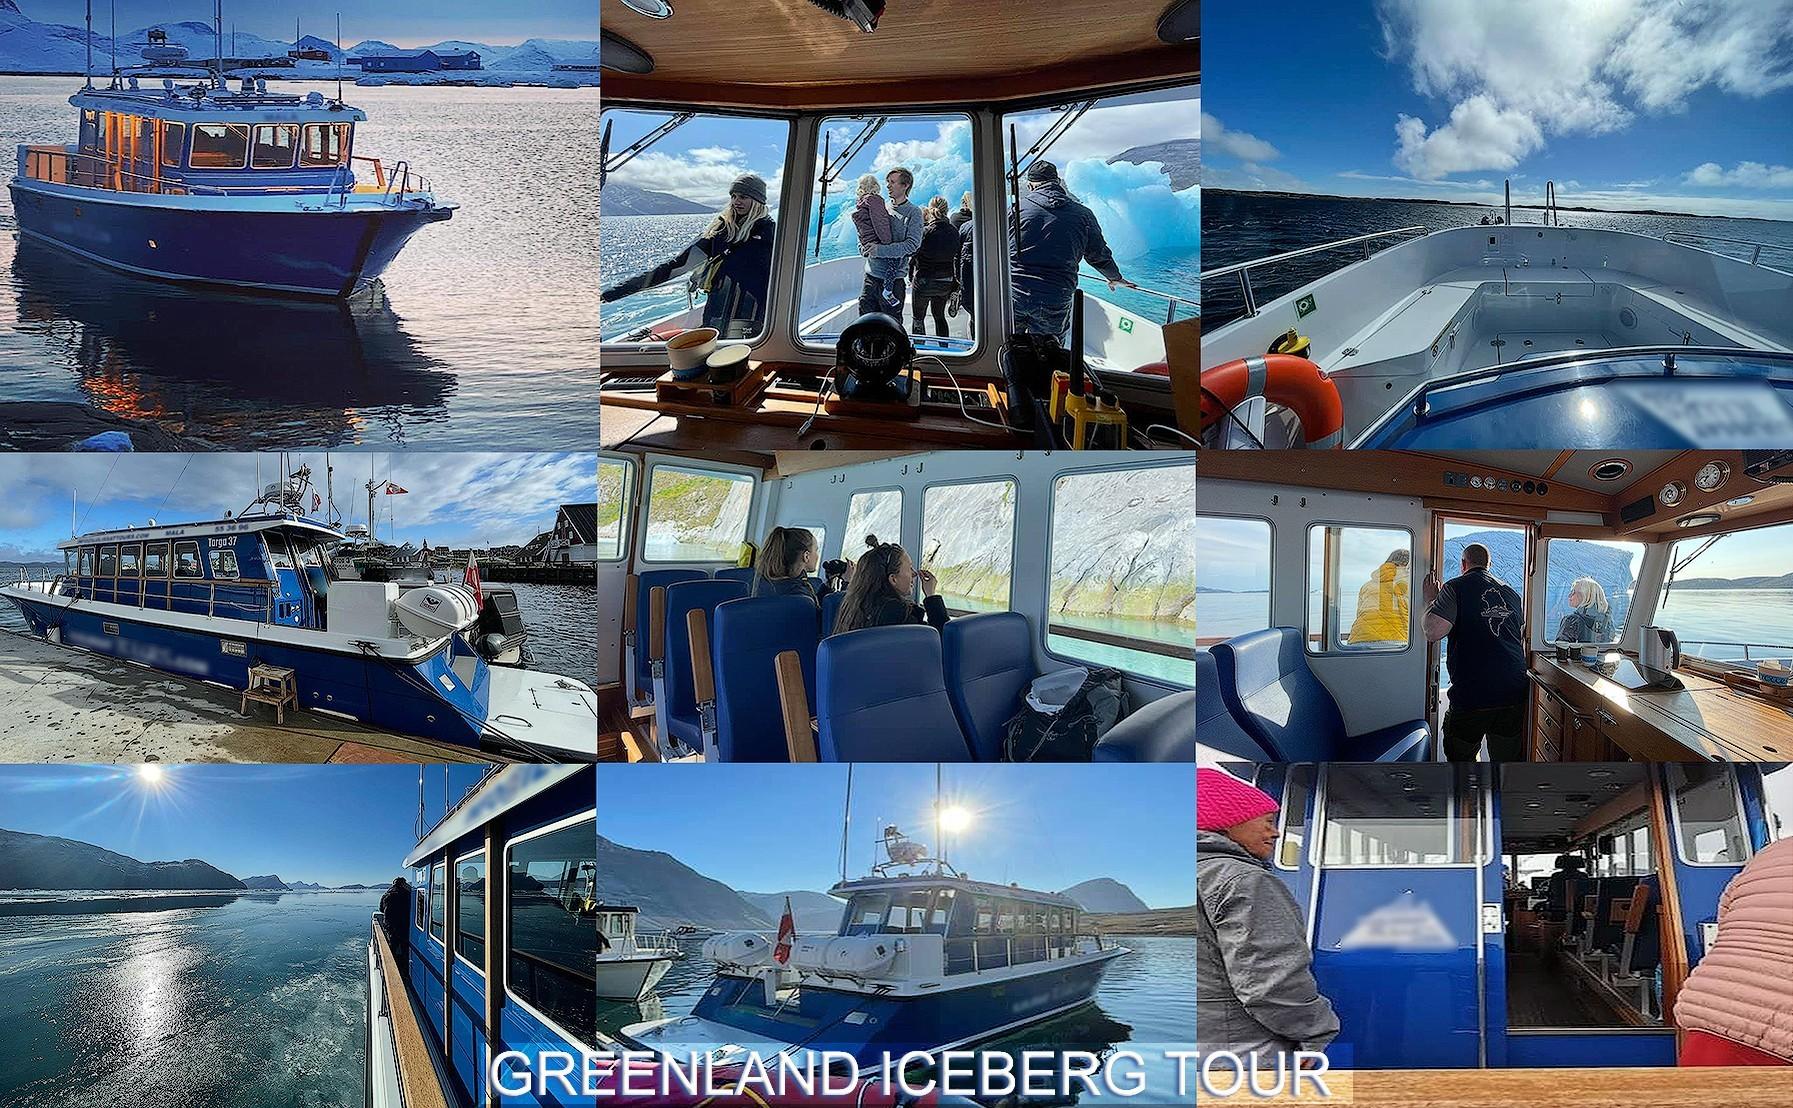 GREENLAND ICEBERG TOUR